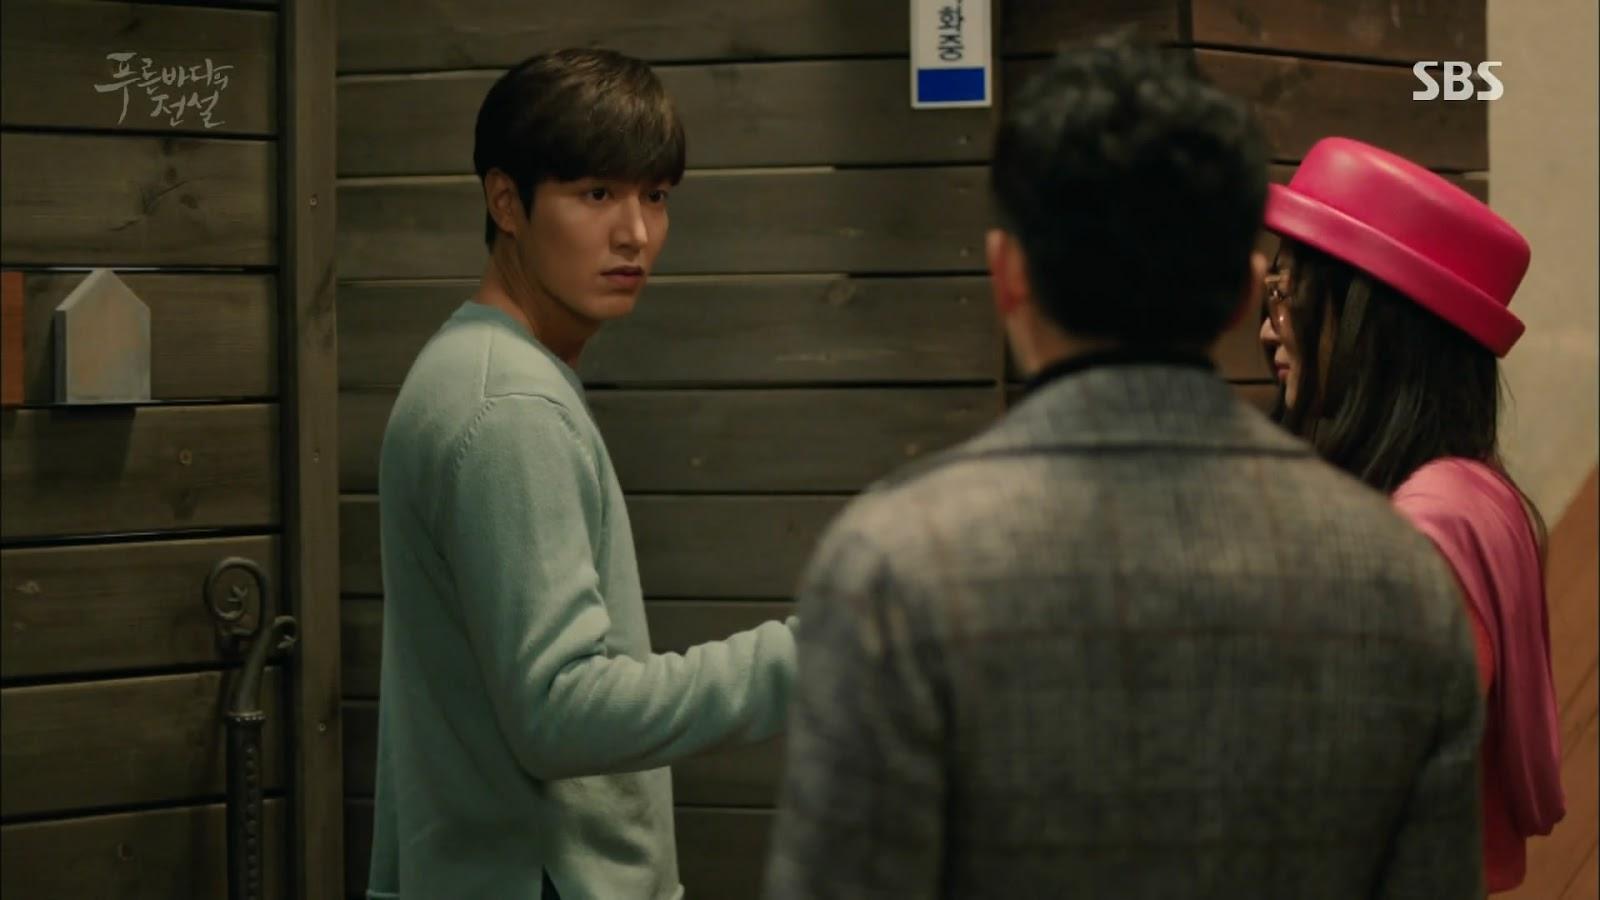 Screenshot Joon Jea has Jealous The Legend Of The Blu Sea (2016)  1080p Episode 07 - www.uchiha-uzuma.com